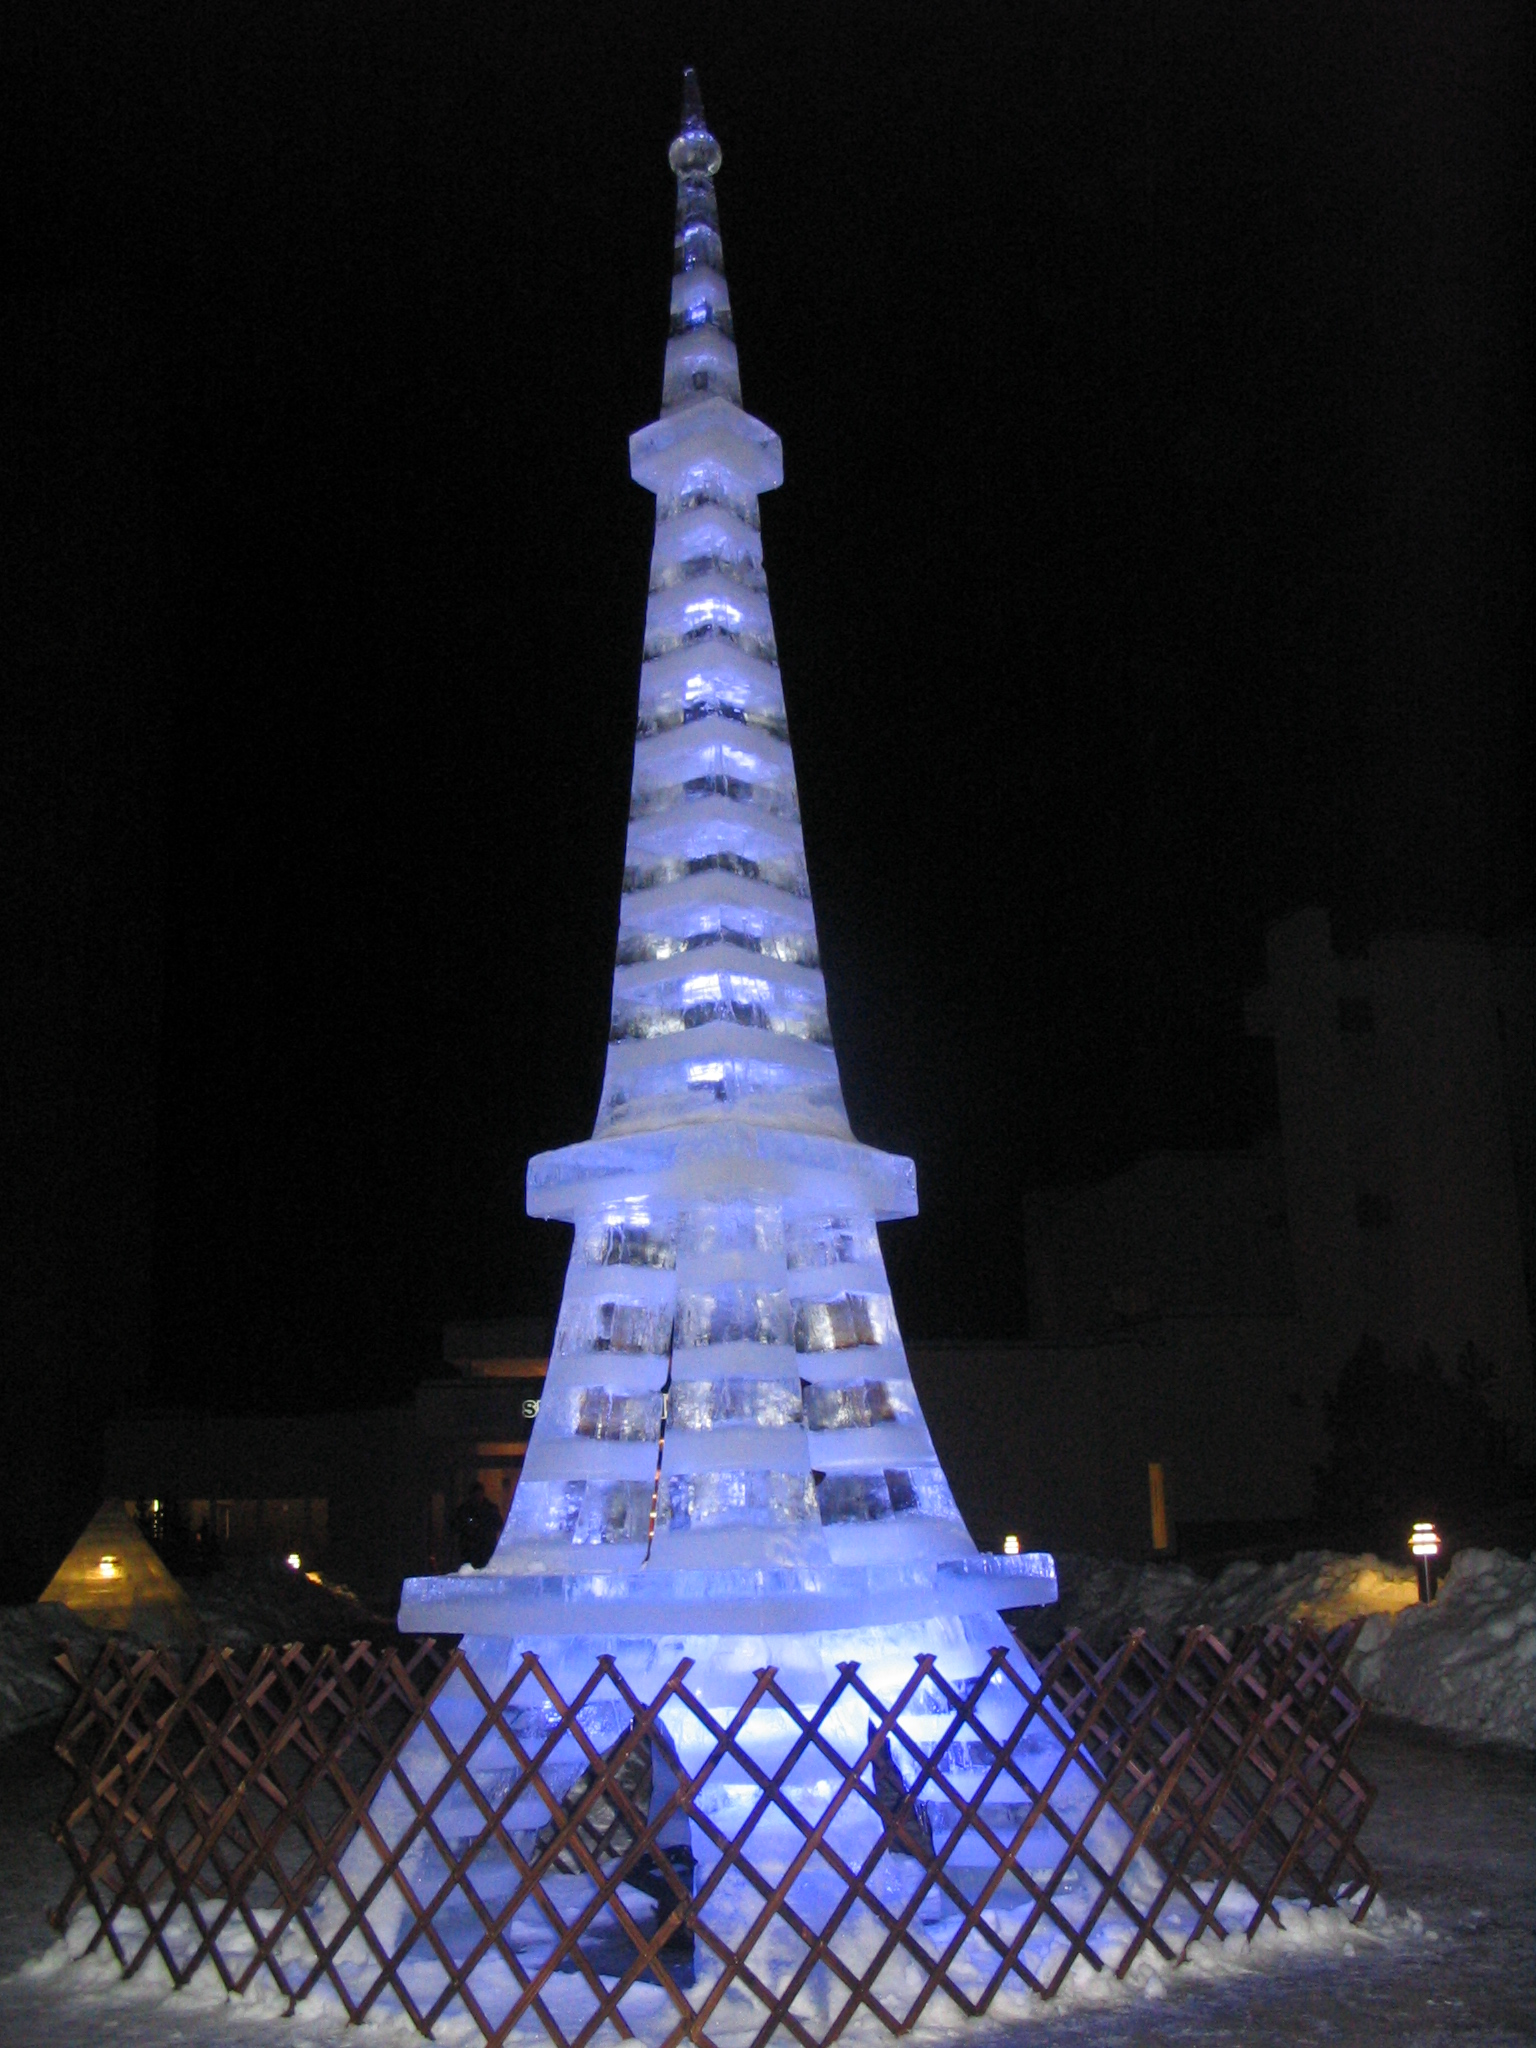 Ice sculpture-Eiffel tower by AWArija